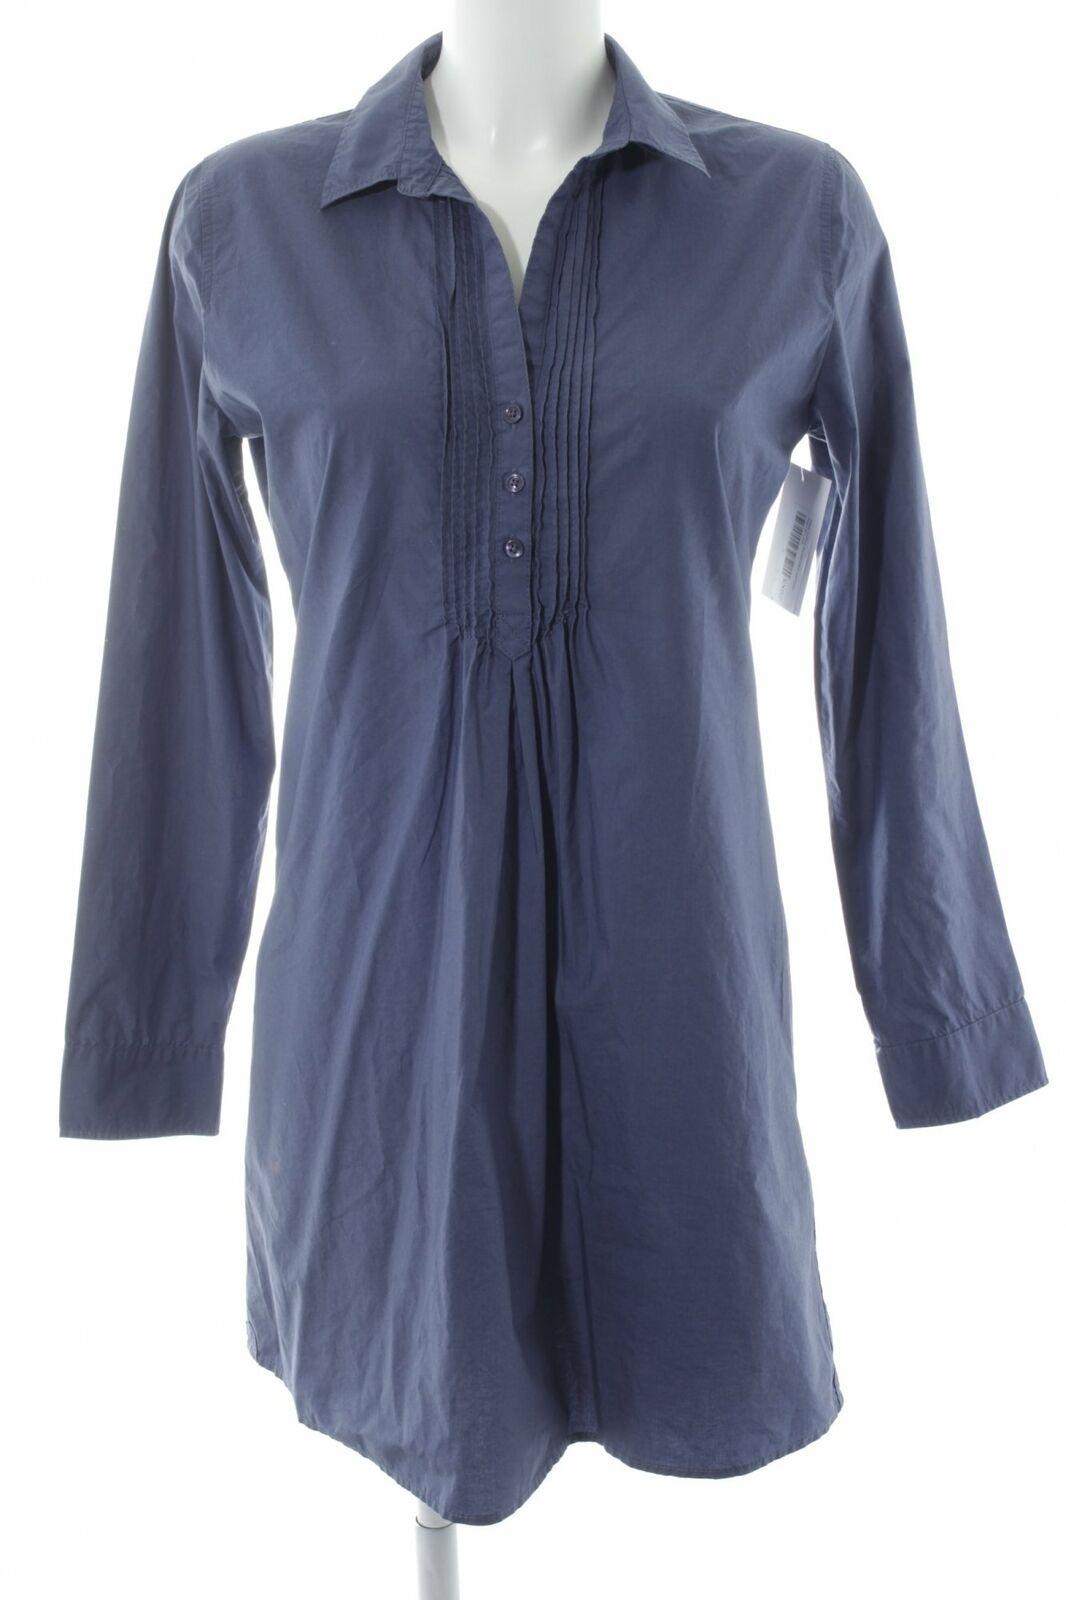 MARC O'POLO Blusenkleid stahlblau Casual-Look Damen Gr. DE 36 Kleid Dress